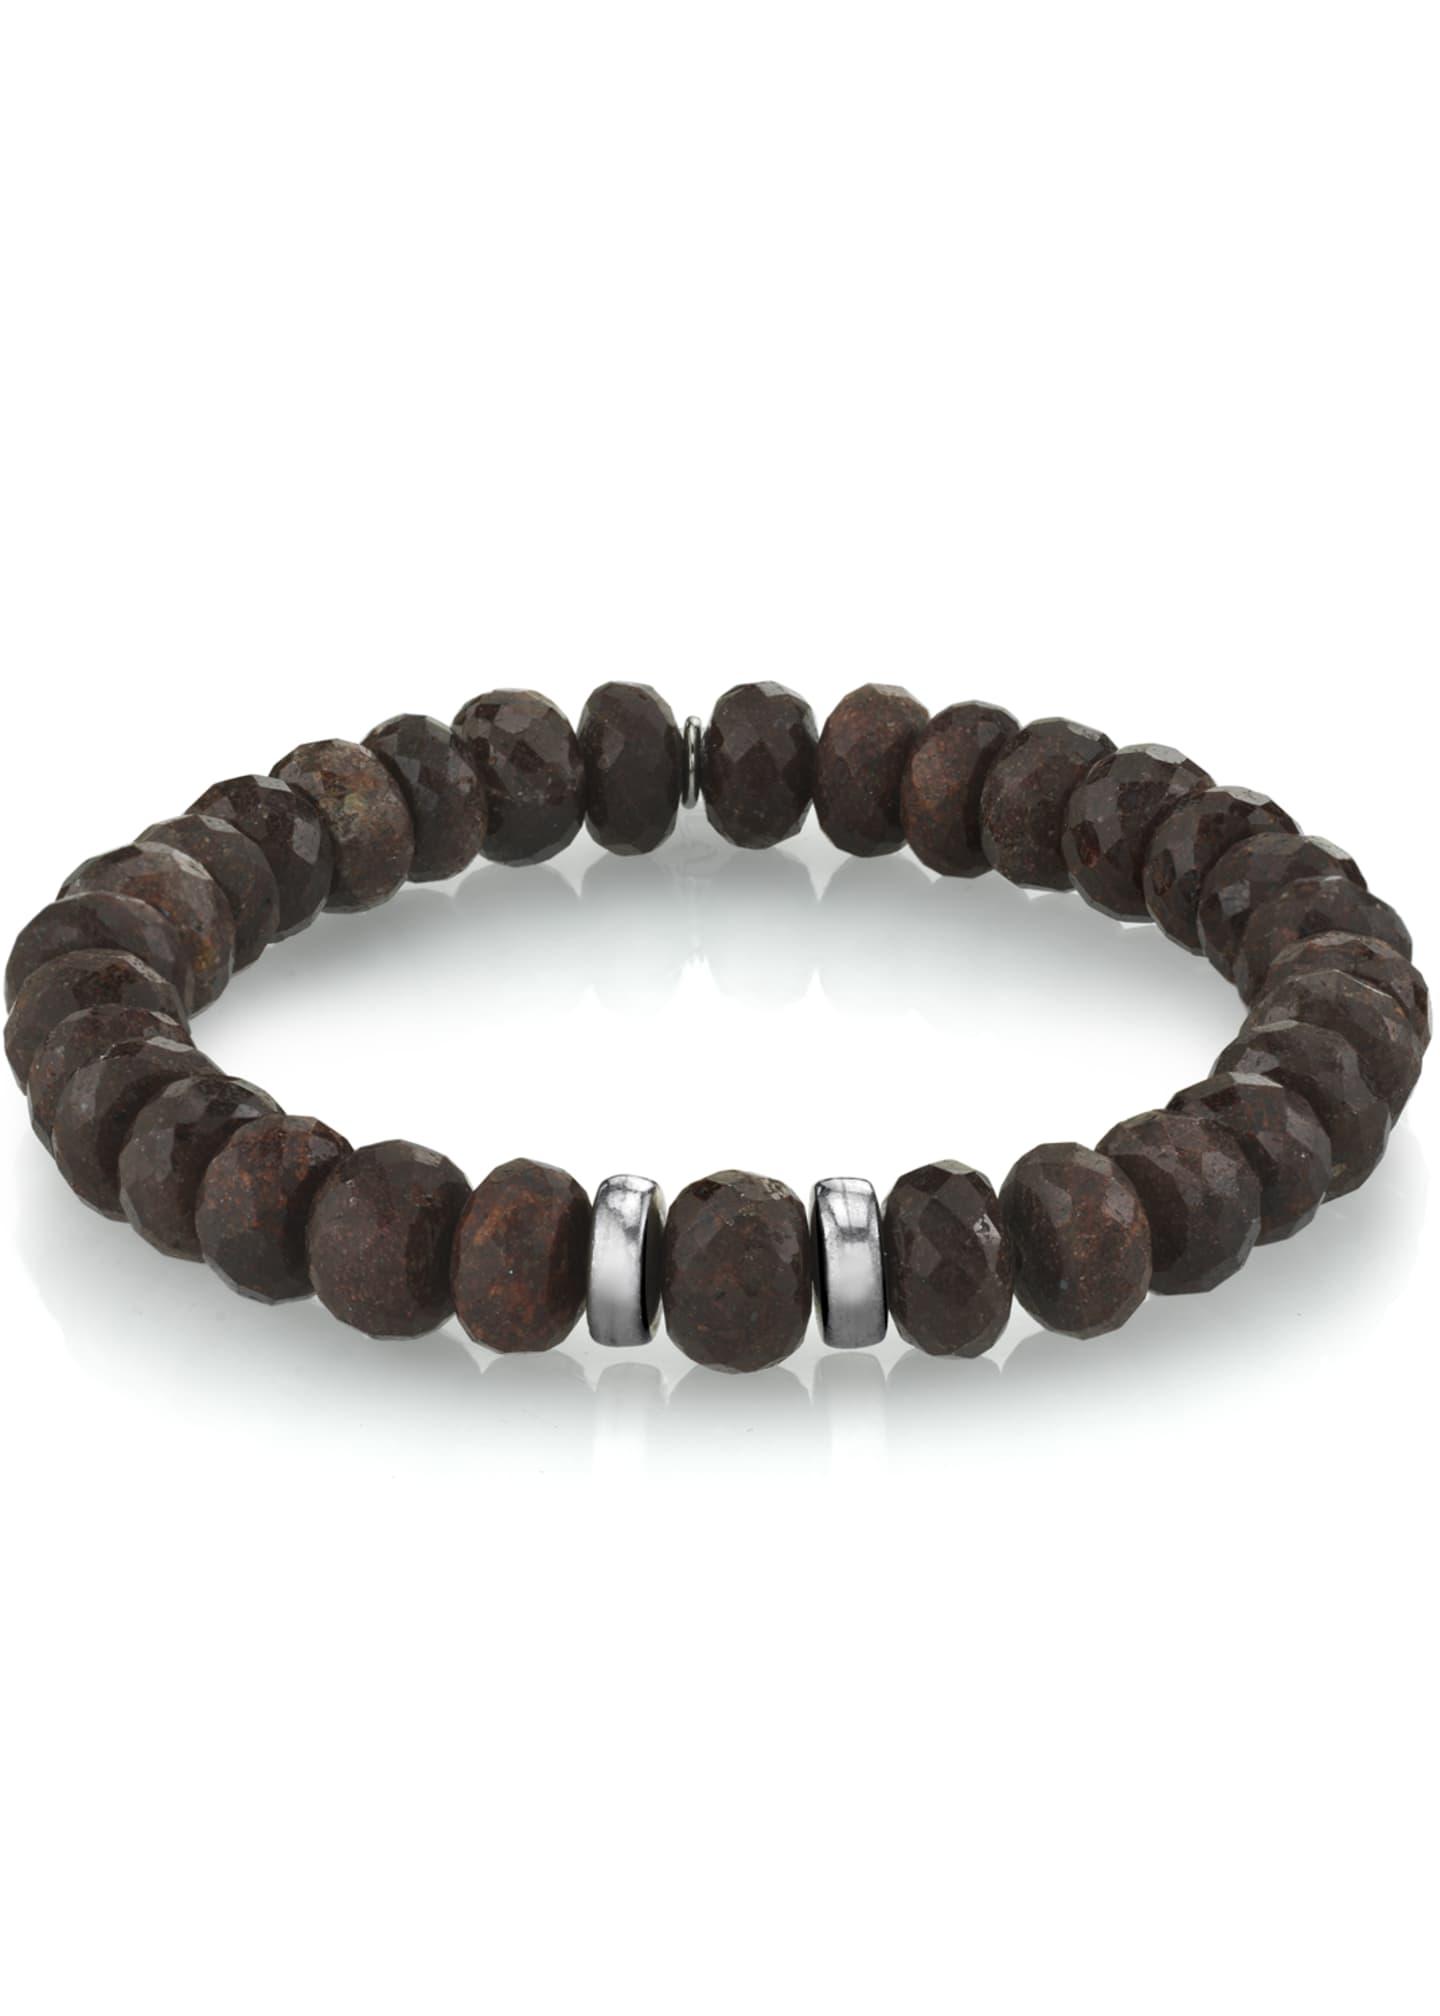 Mr. Lowe Men's Coffee Quartz Bracelet, Size M